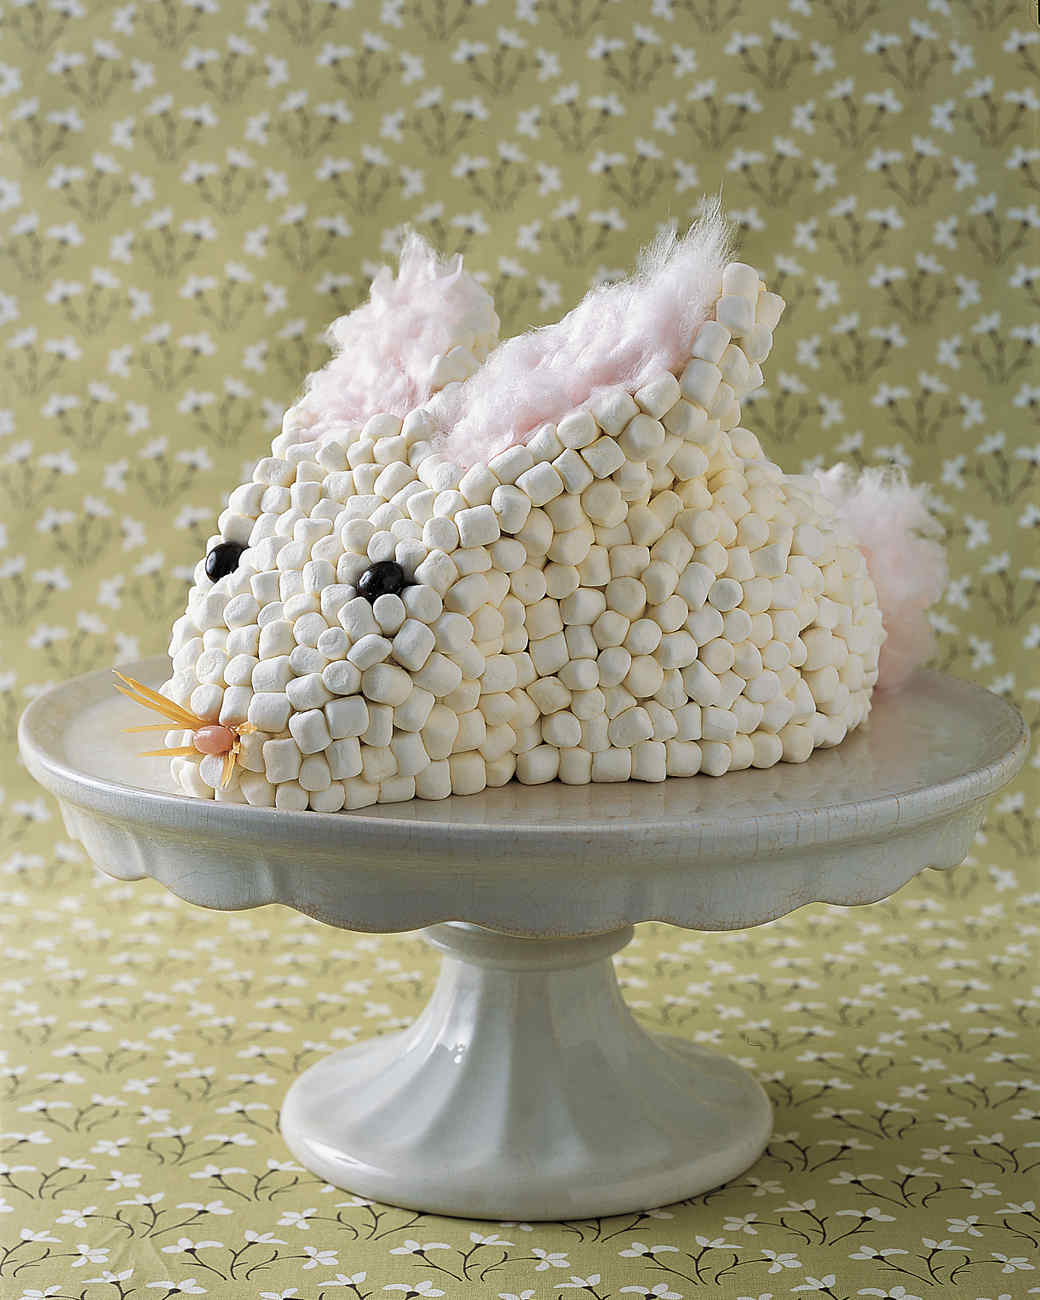 bunny-cake-0405-mla101199.jpg